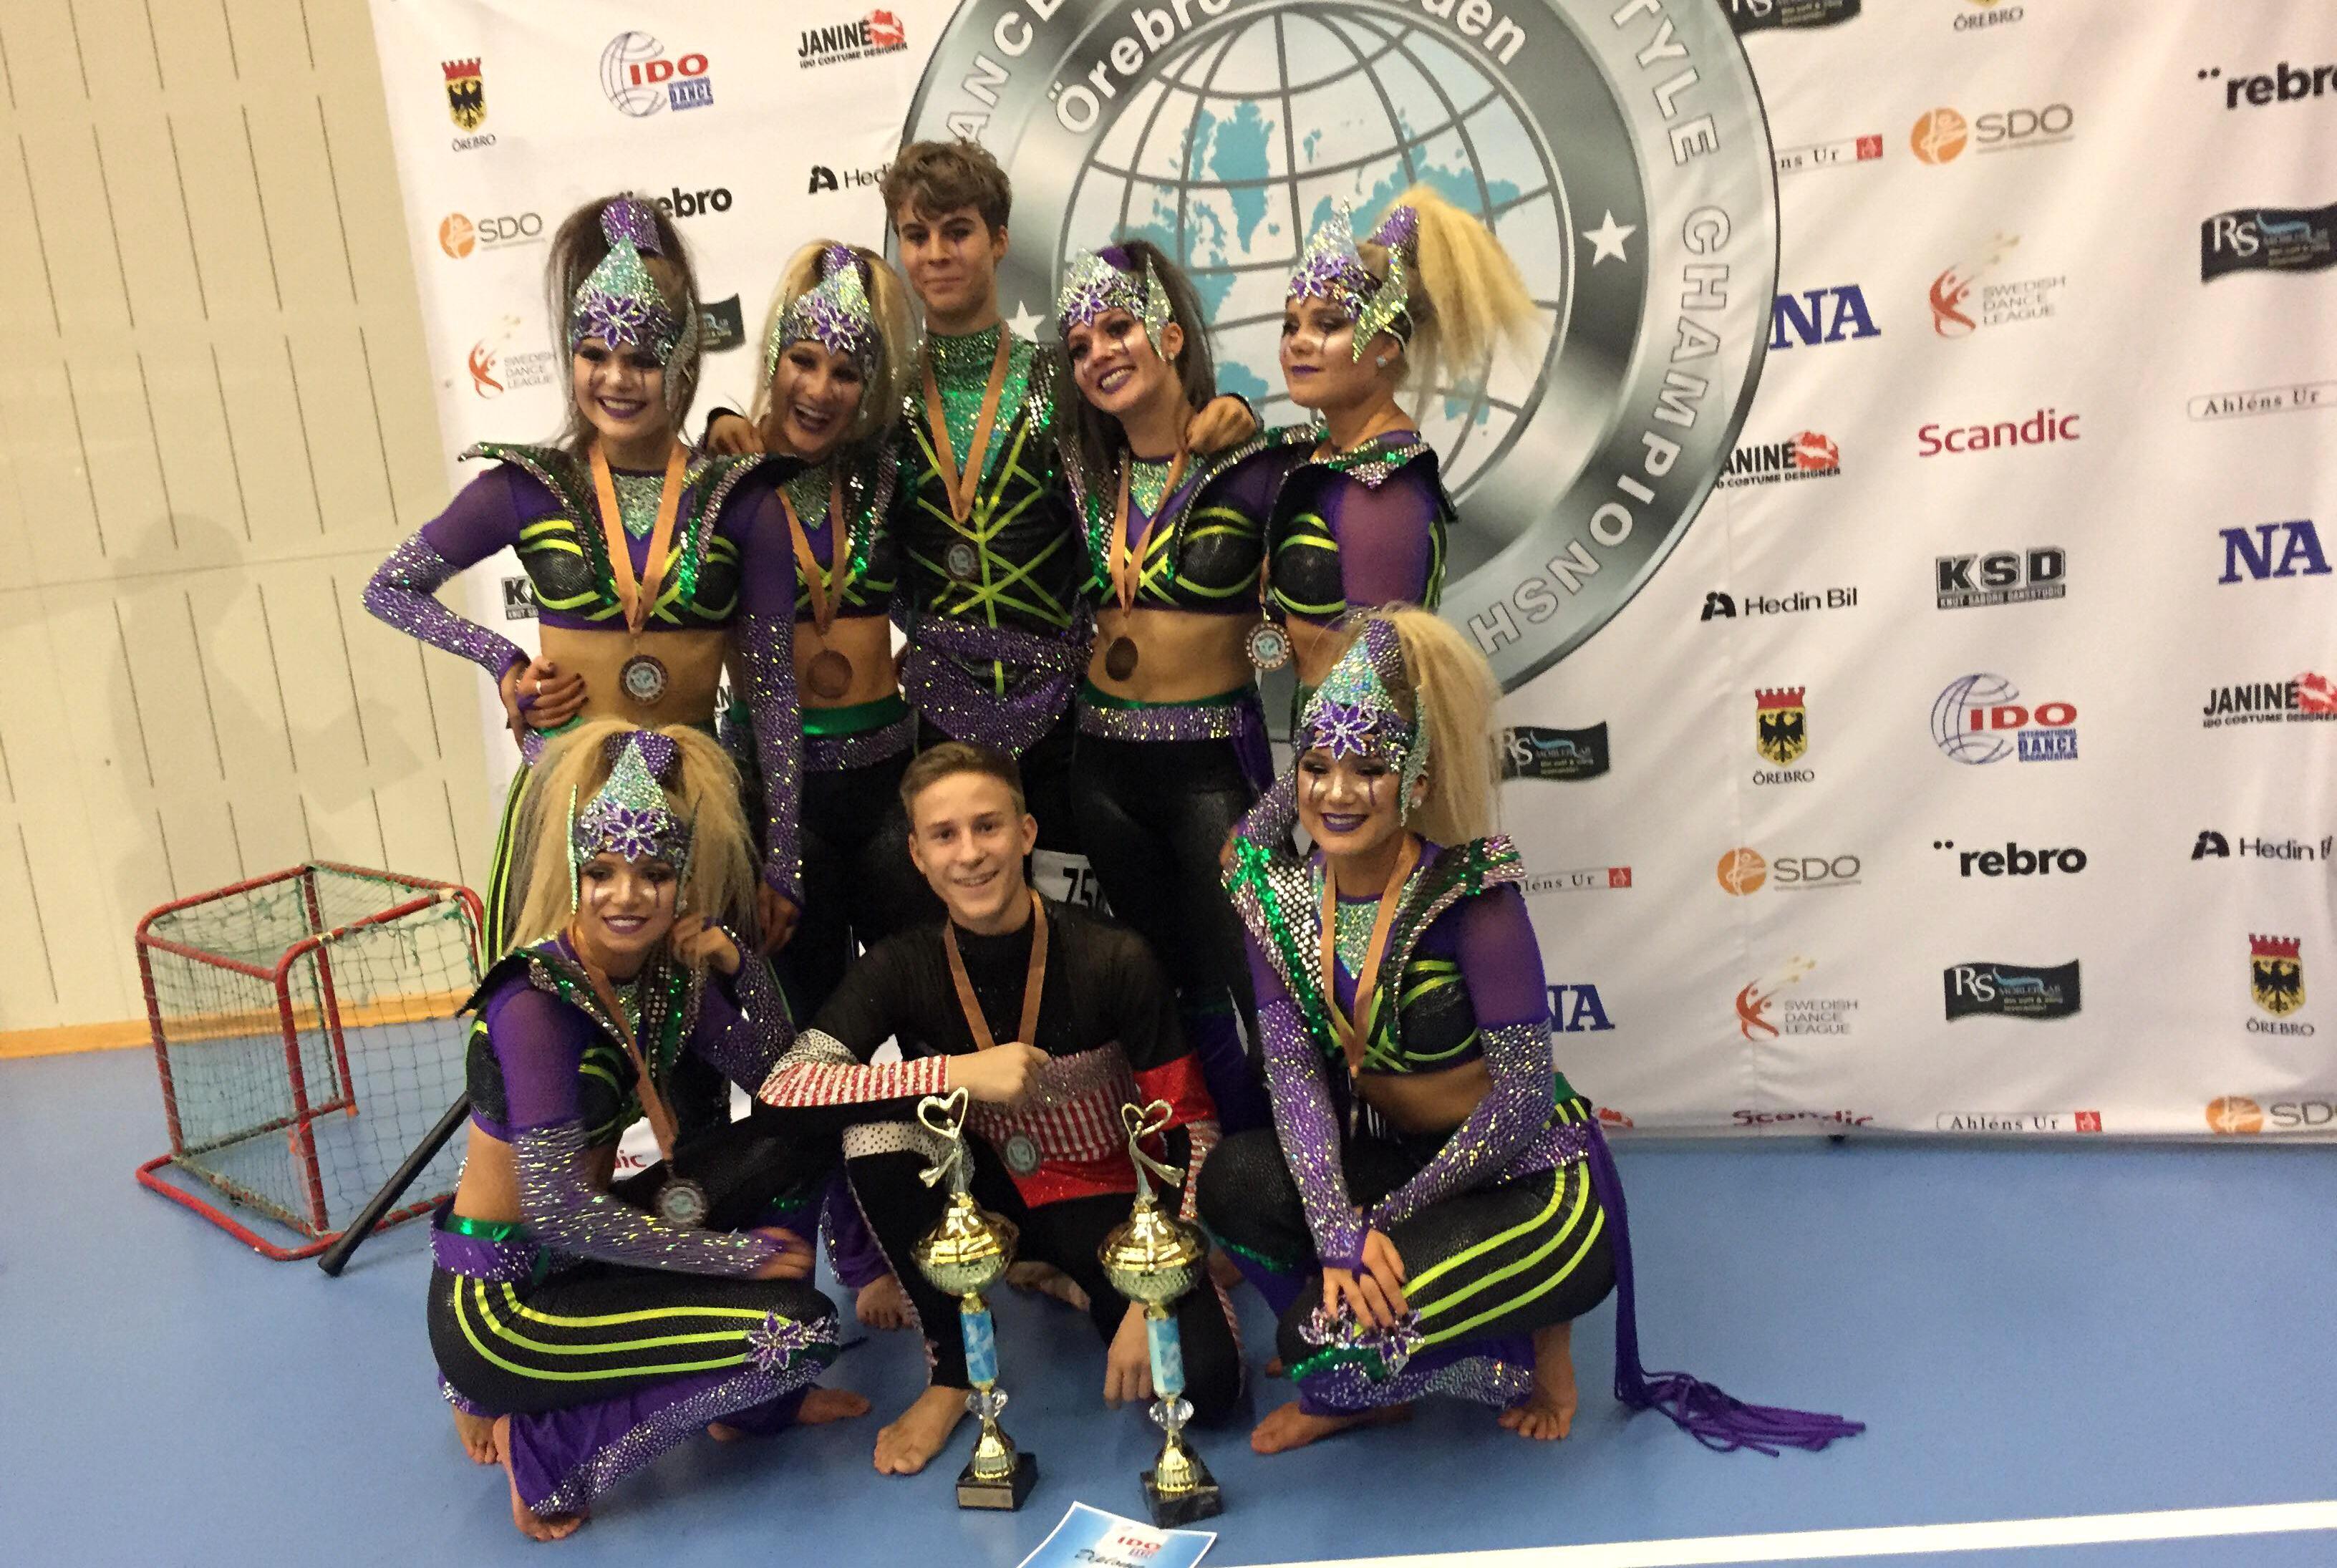 EBF Dance Crew och Douglas Junger firar sina fina pallplatser under WM i Disco i Örebro.